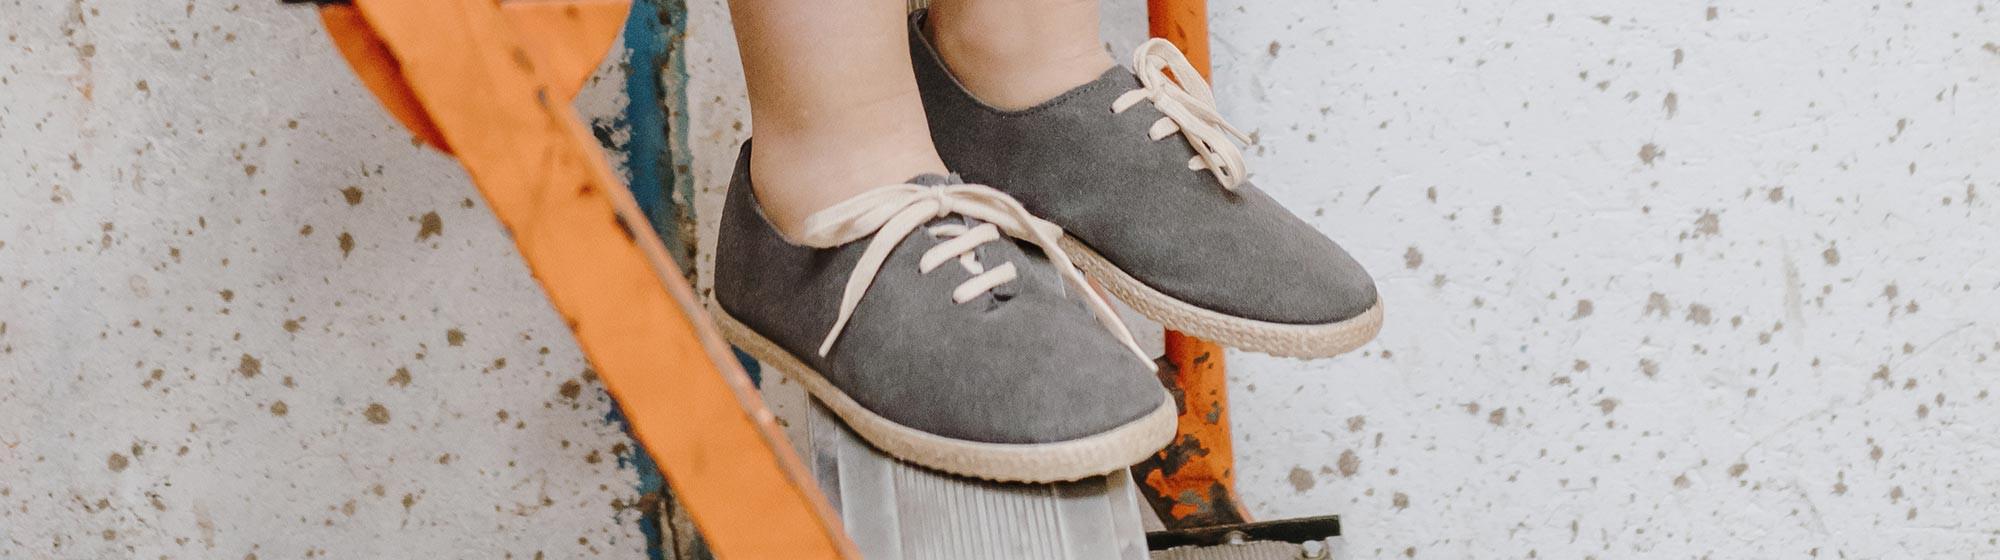 6907dde8f Zapatos Blucher para Niño. Zapatería online para Niños